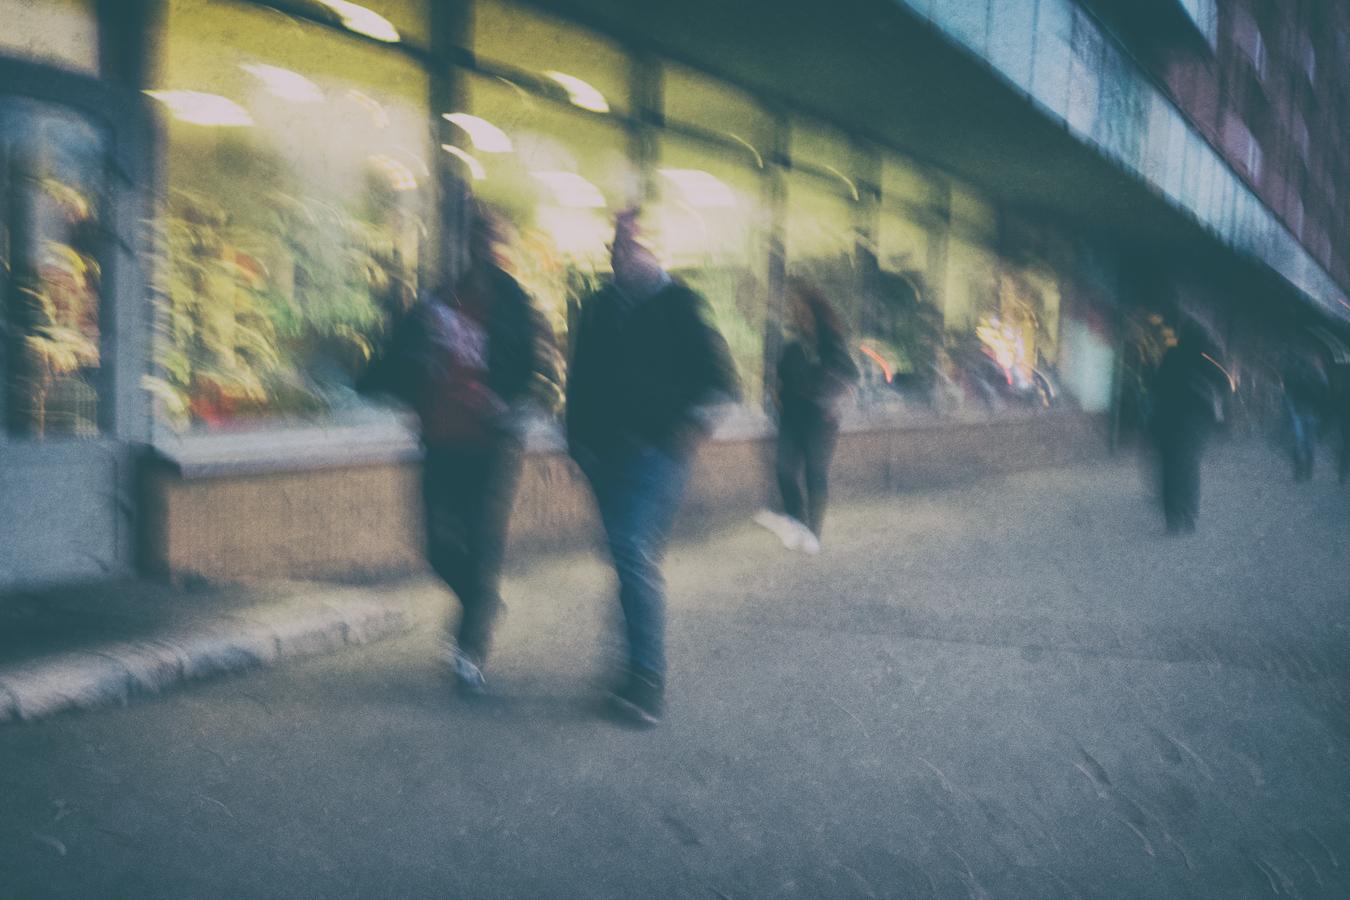 Reflexia z chodníka